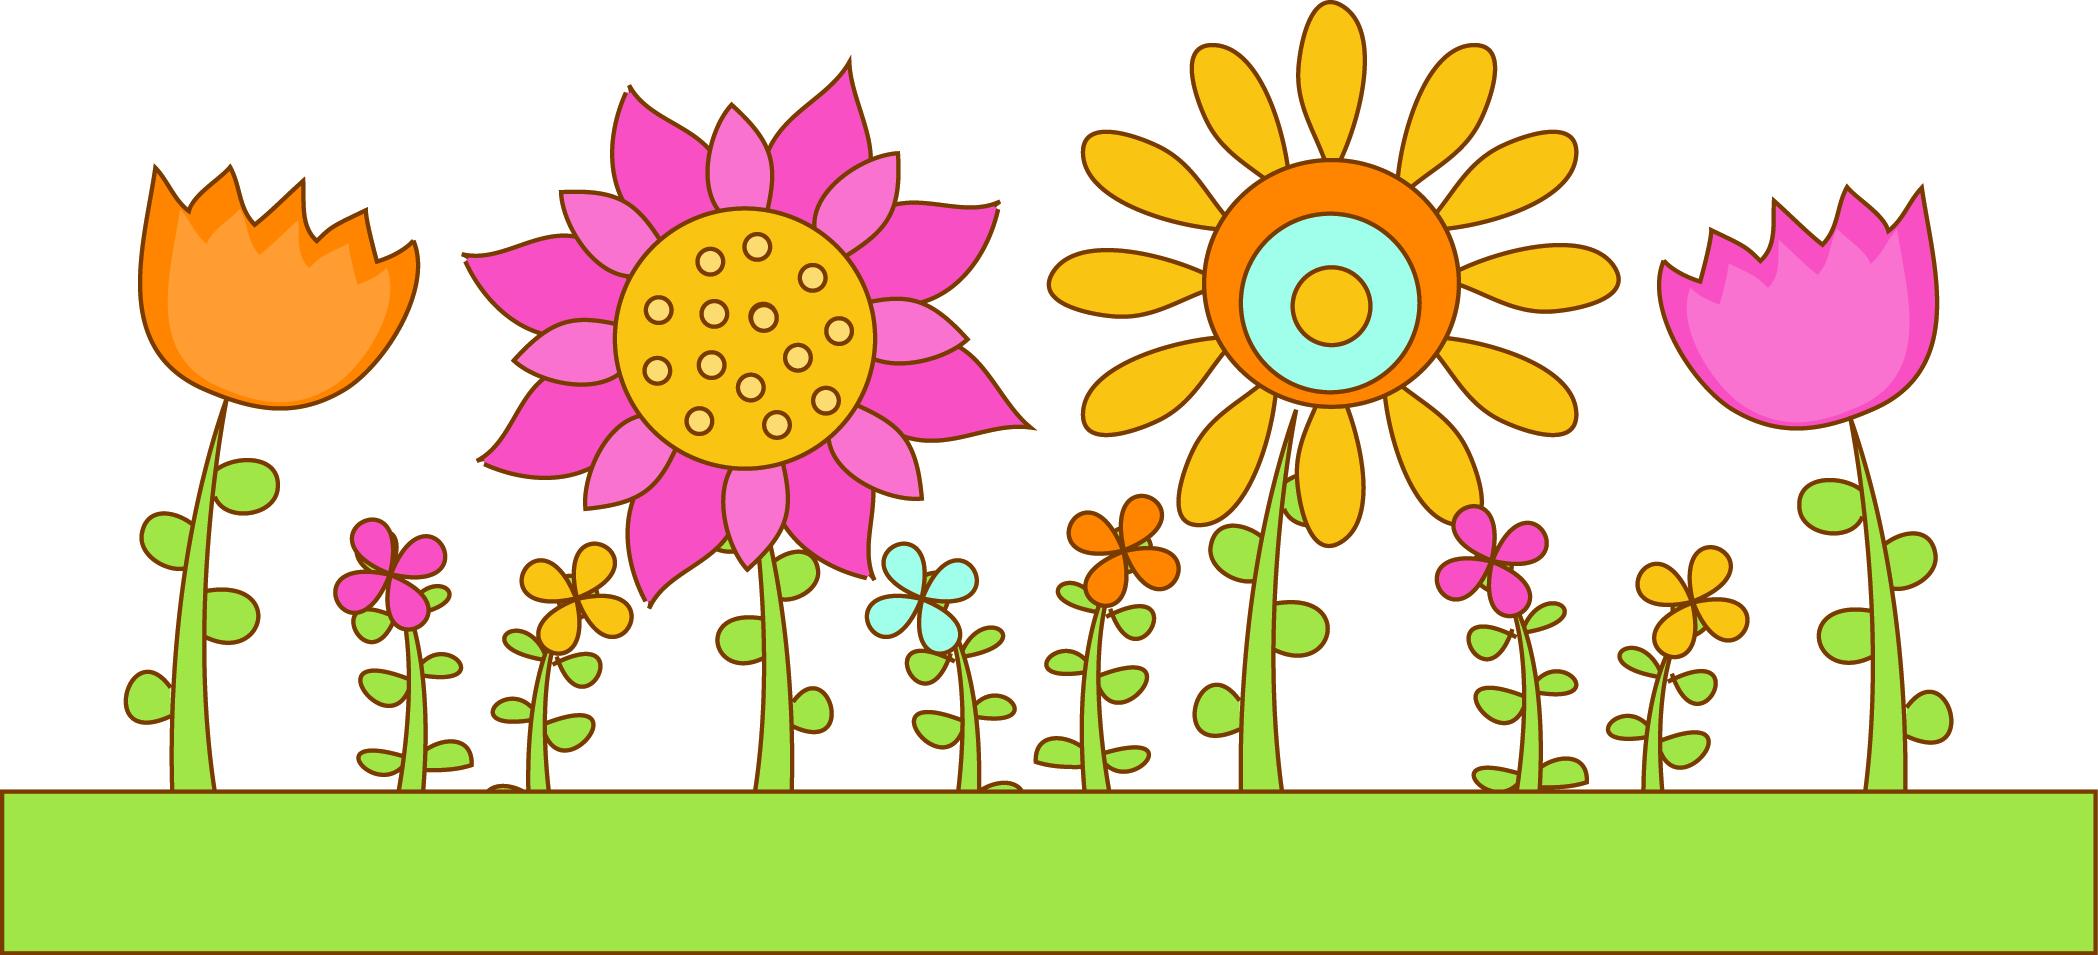 Flower row clipart image download Garden row clipart - ClipartFest image download